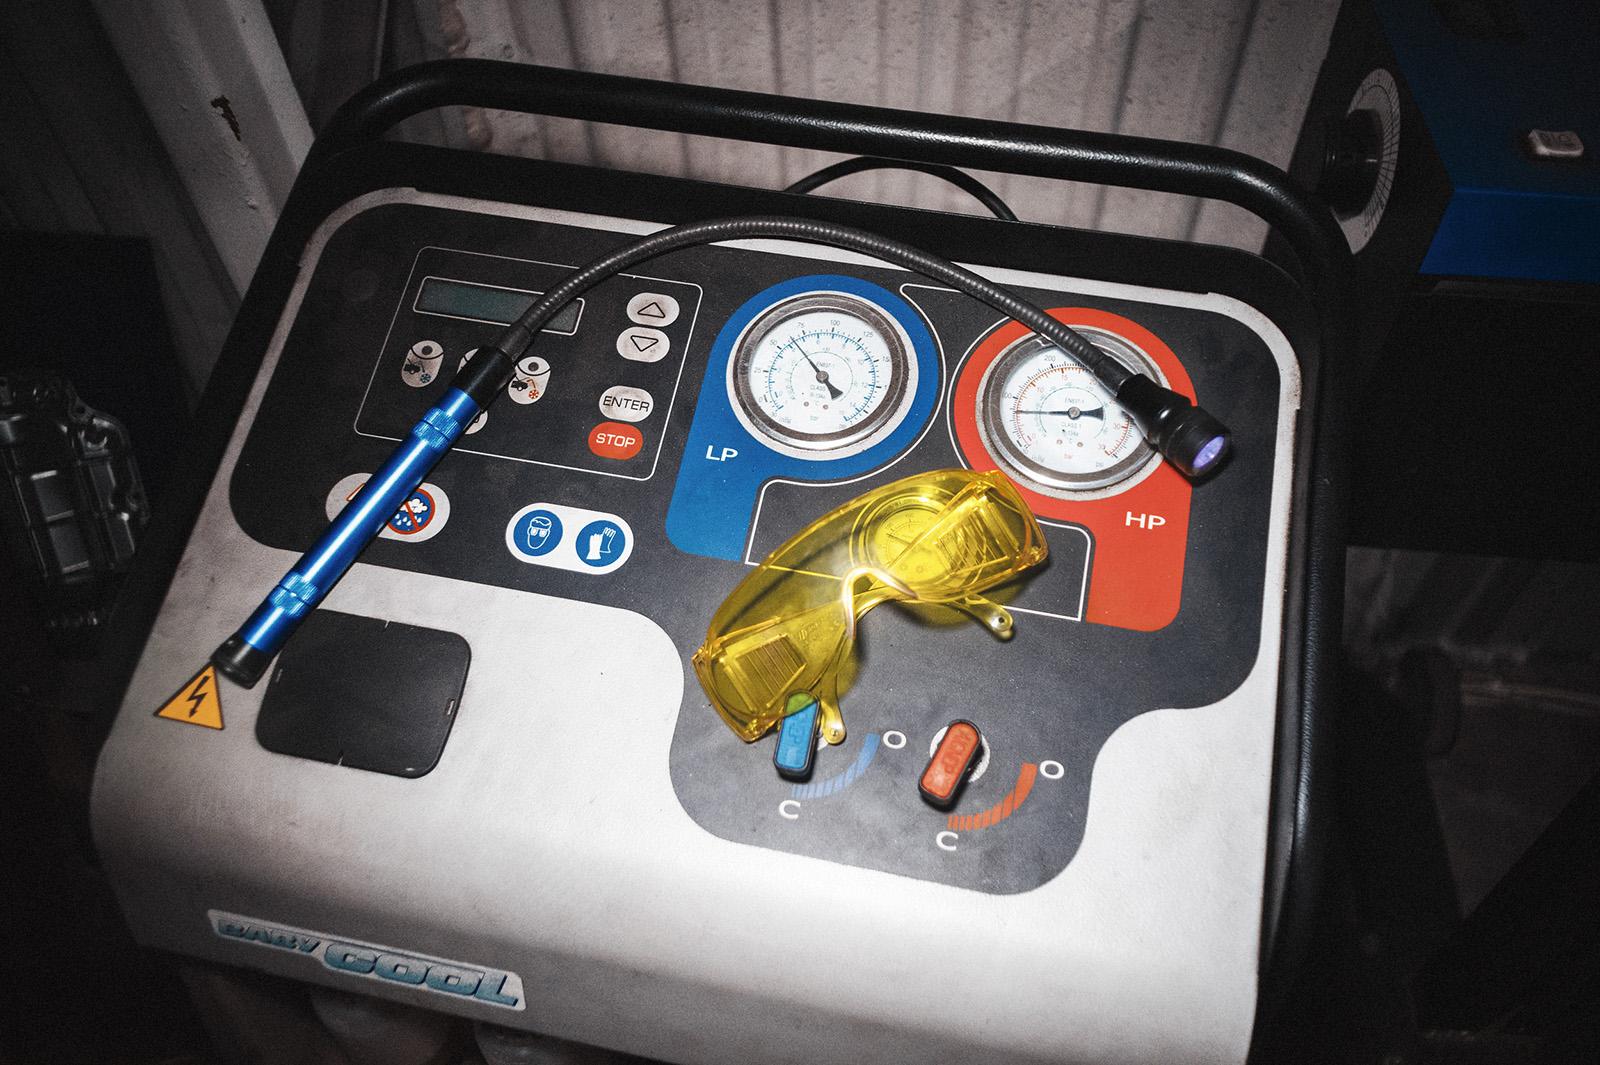 Трубка кондиционера Ауди Q7 – поиск течи и замена